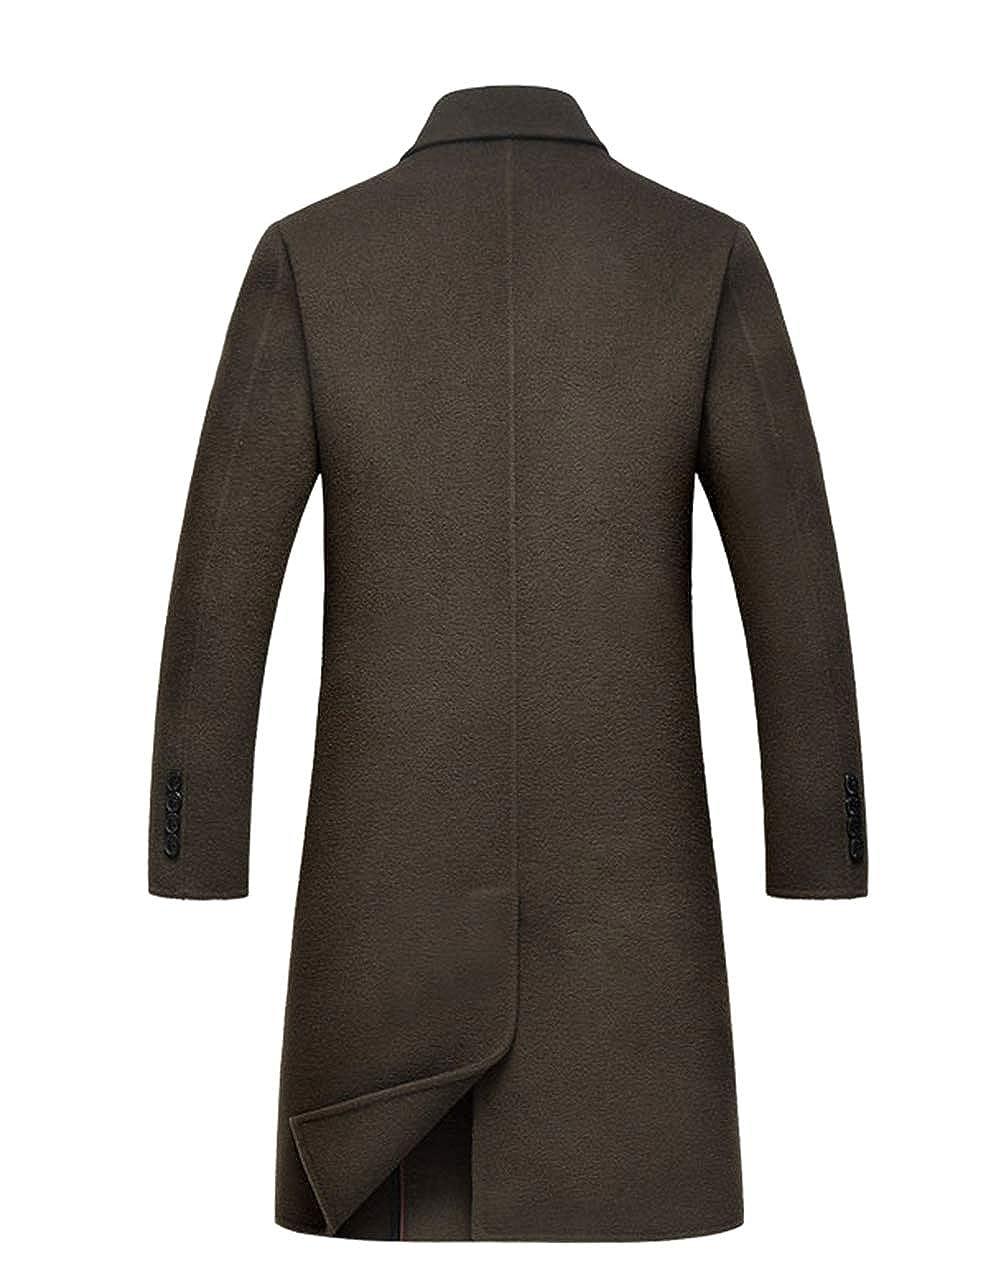 SK Studio Studio Studio Herren Kaschmir Mantel Business Slim Fit Overcoat Lang Tailor Zweireihig Winterjacke Trenchcoat B07HRN42DL Jacken Die Menschen verlassen sich auf Kleidung f8248b